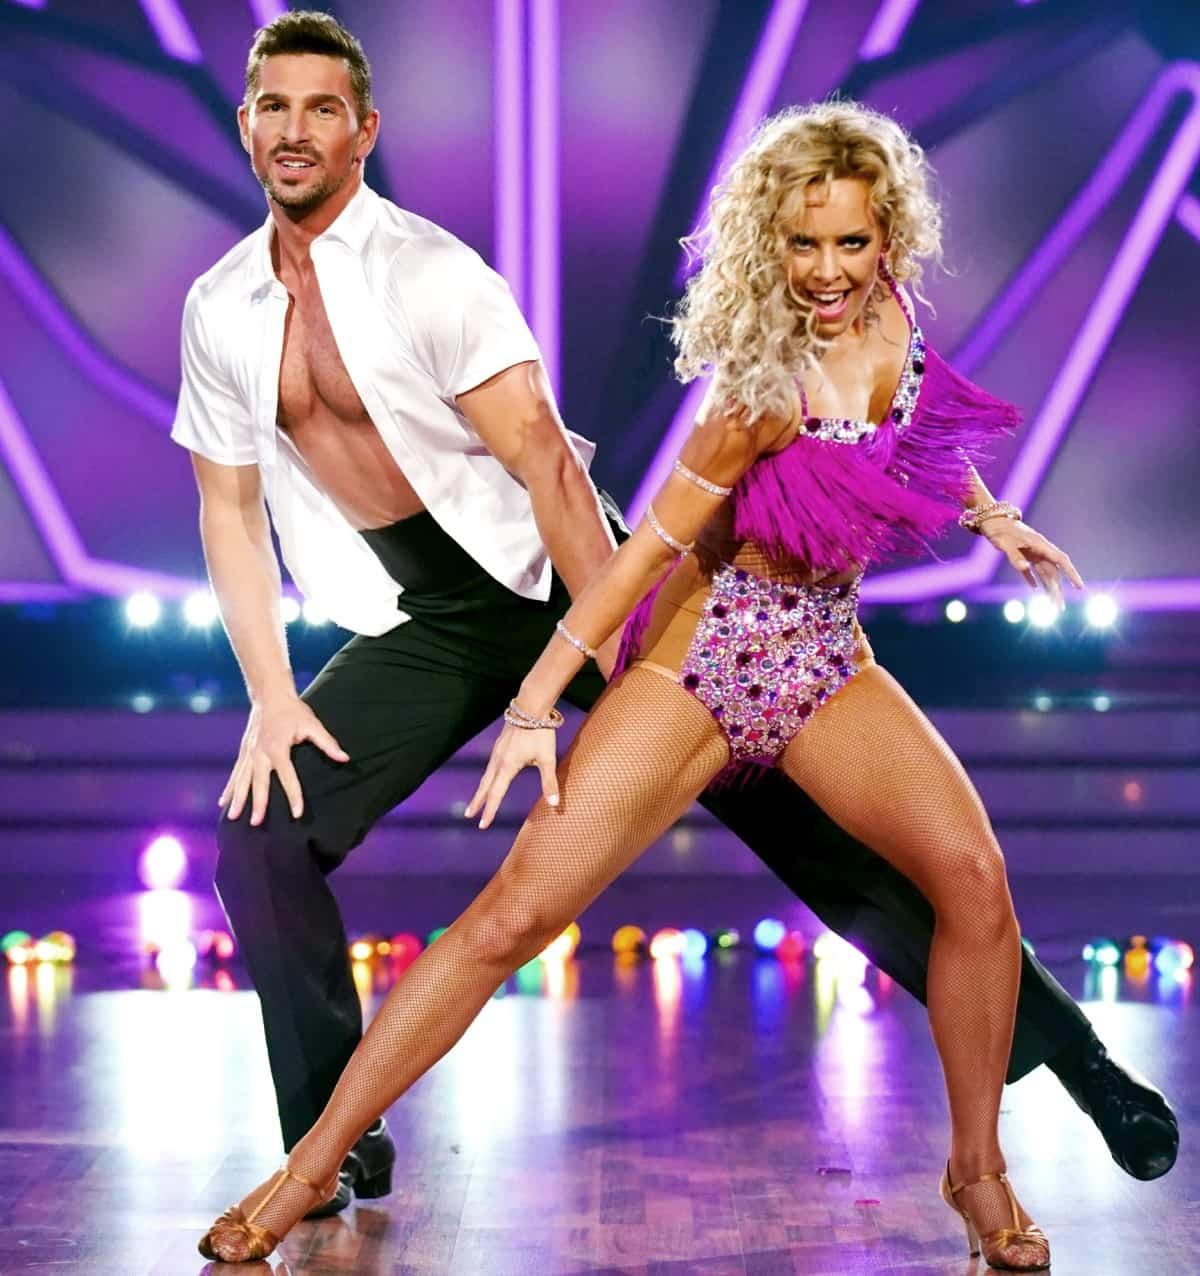 Benjamin Piwko - Isabel Edvardsson bei Let's dance am 17.5.2019